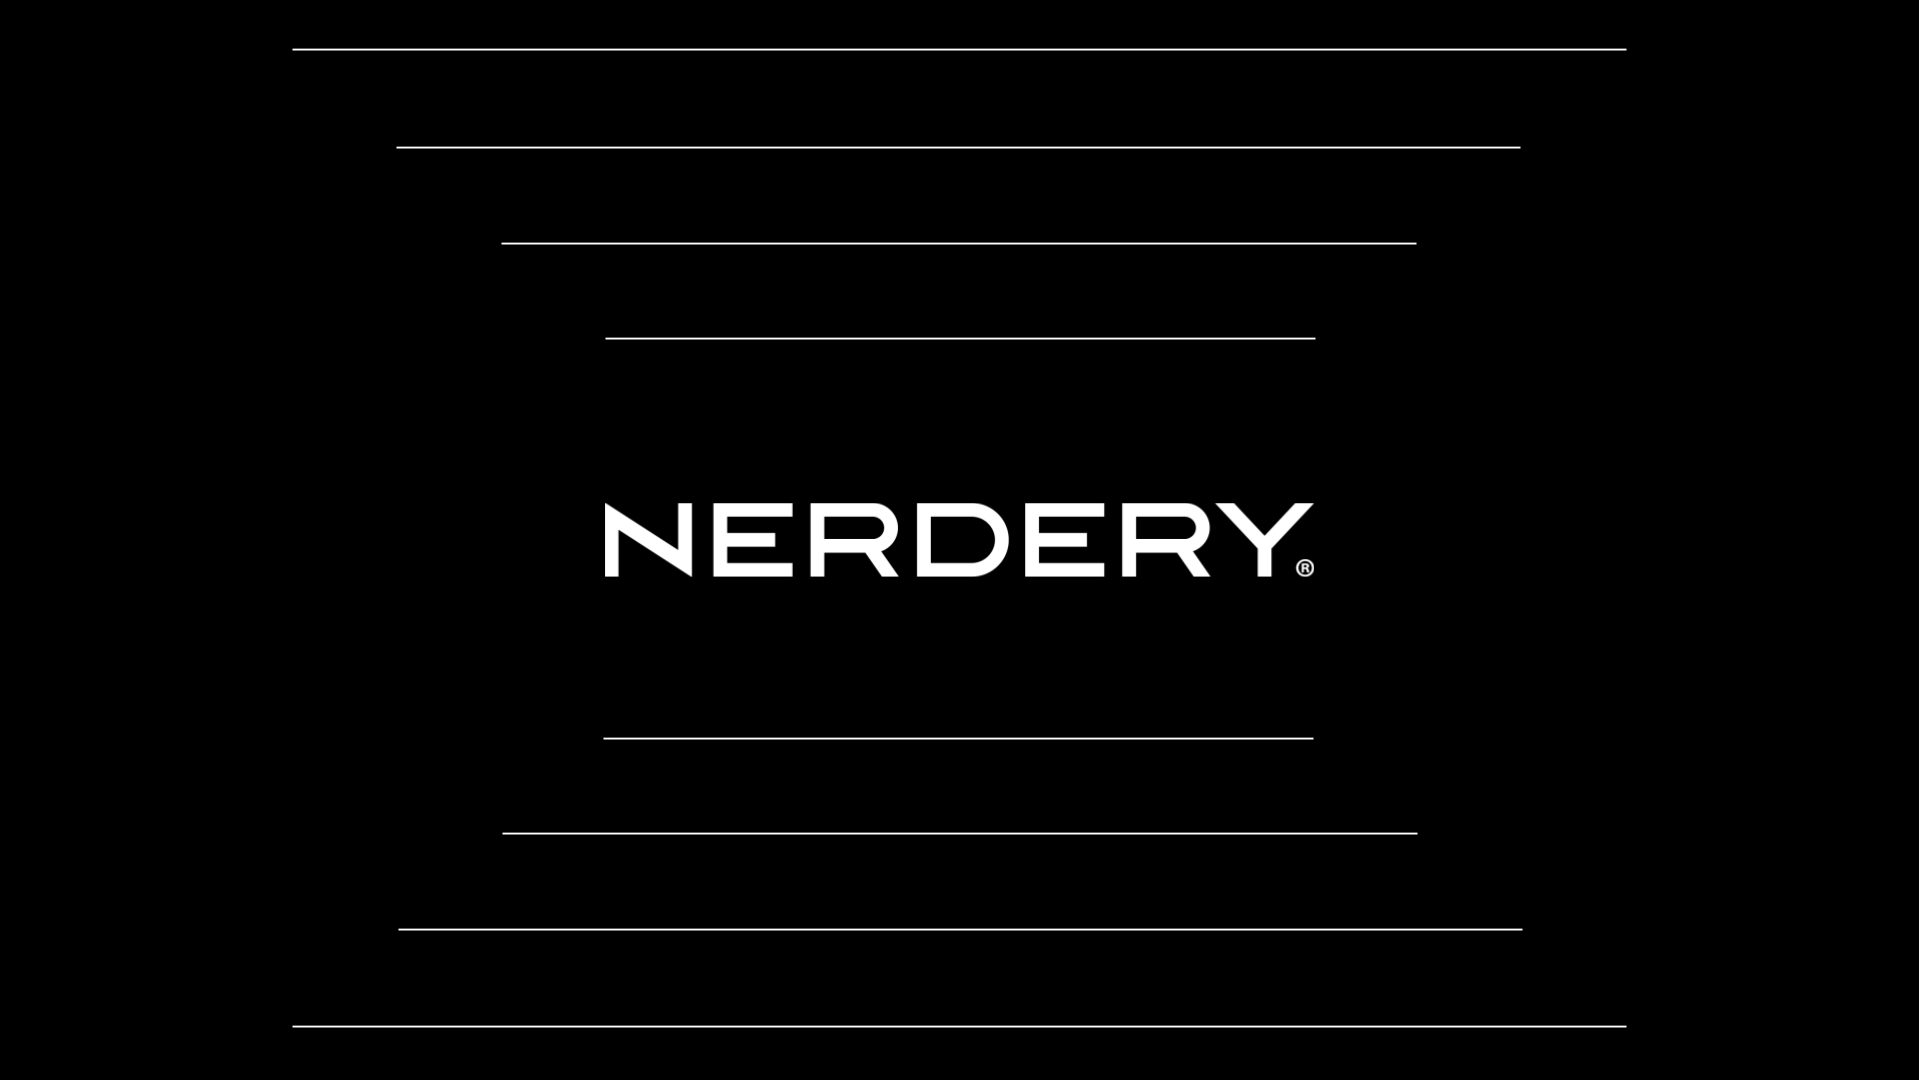 Nerdery Rebranded